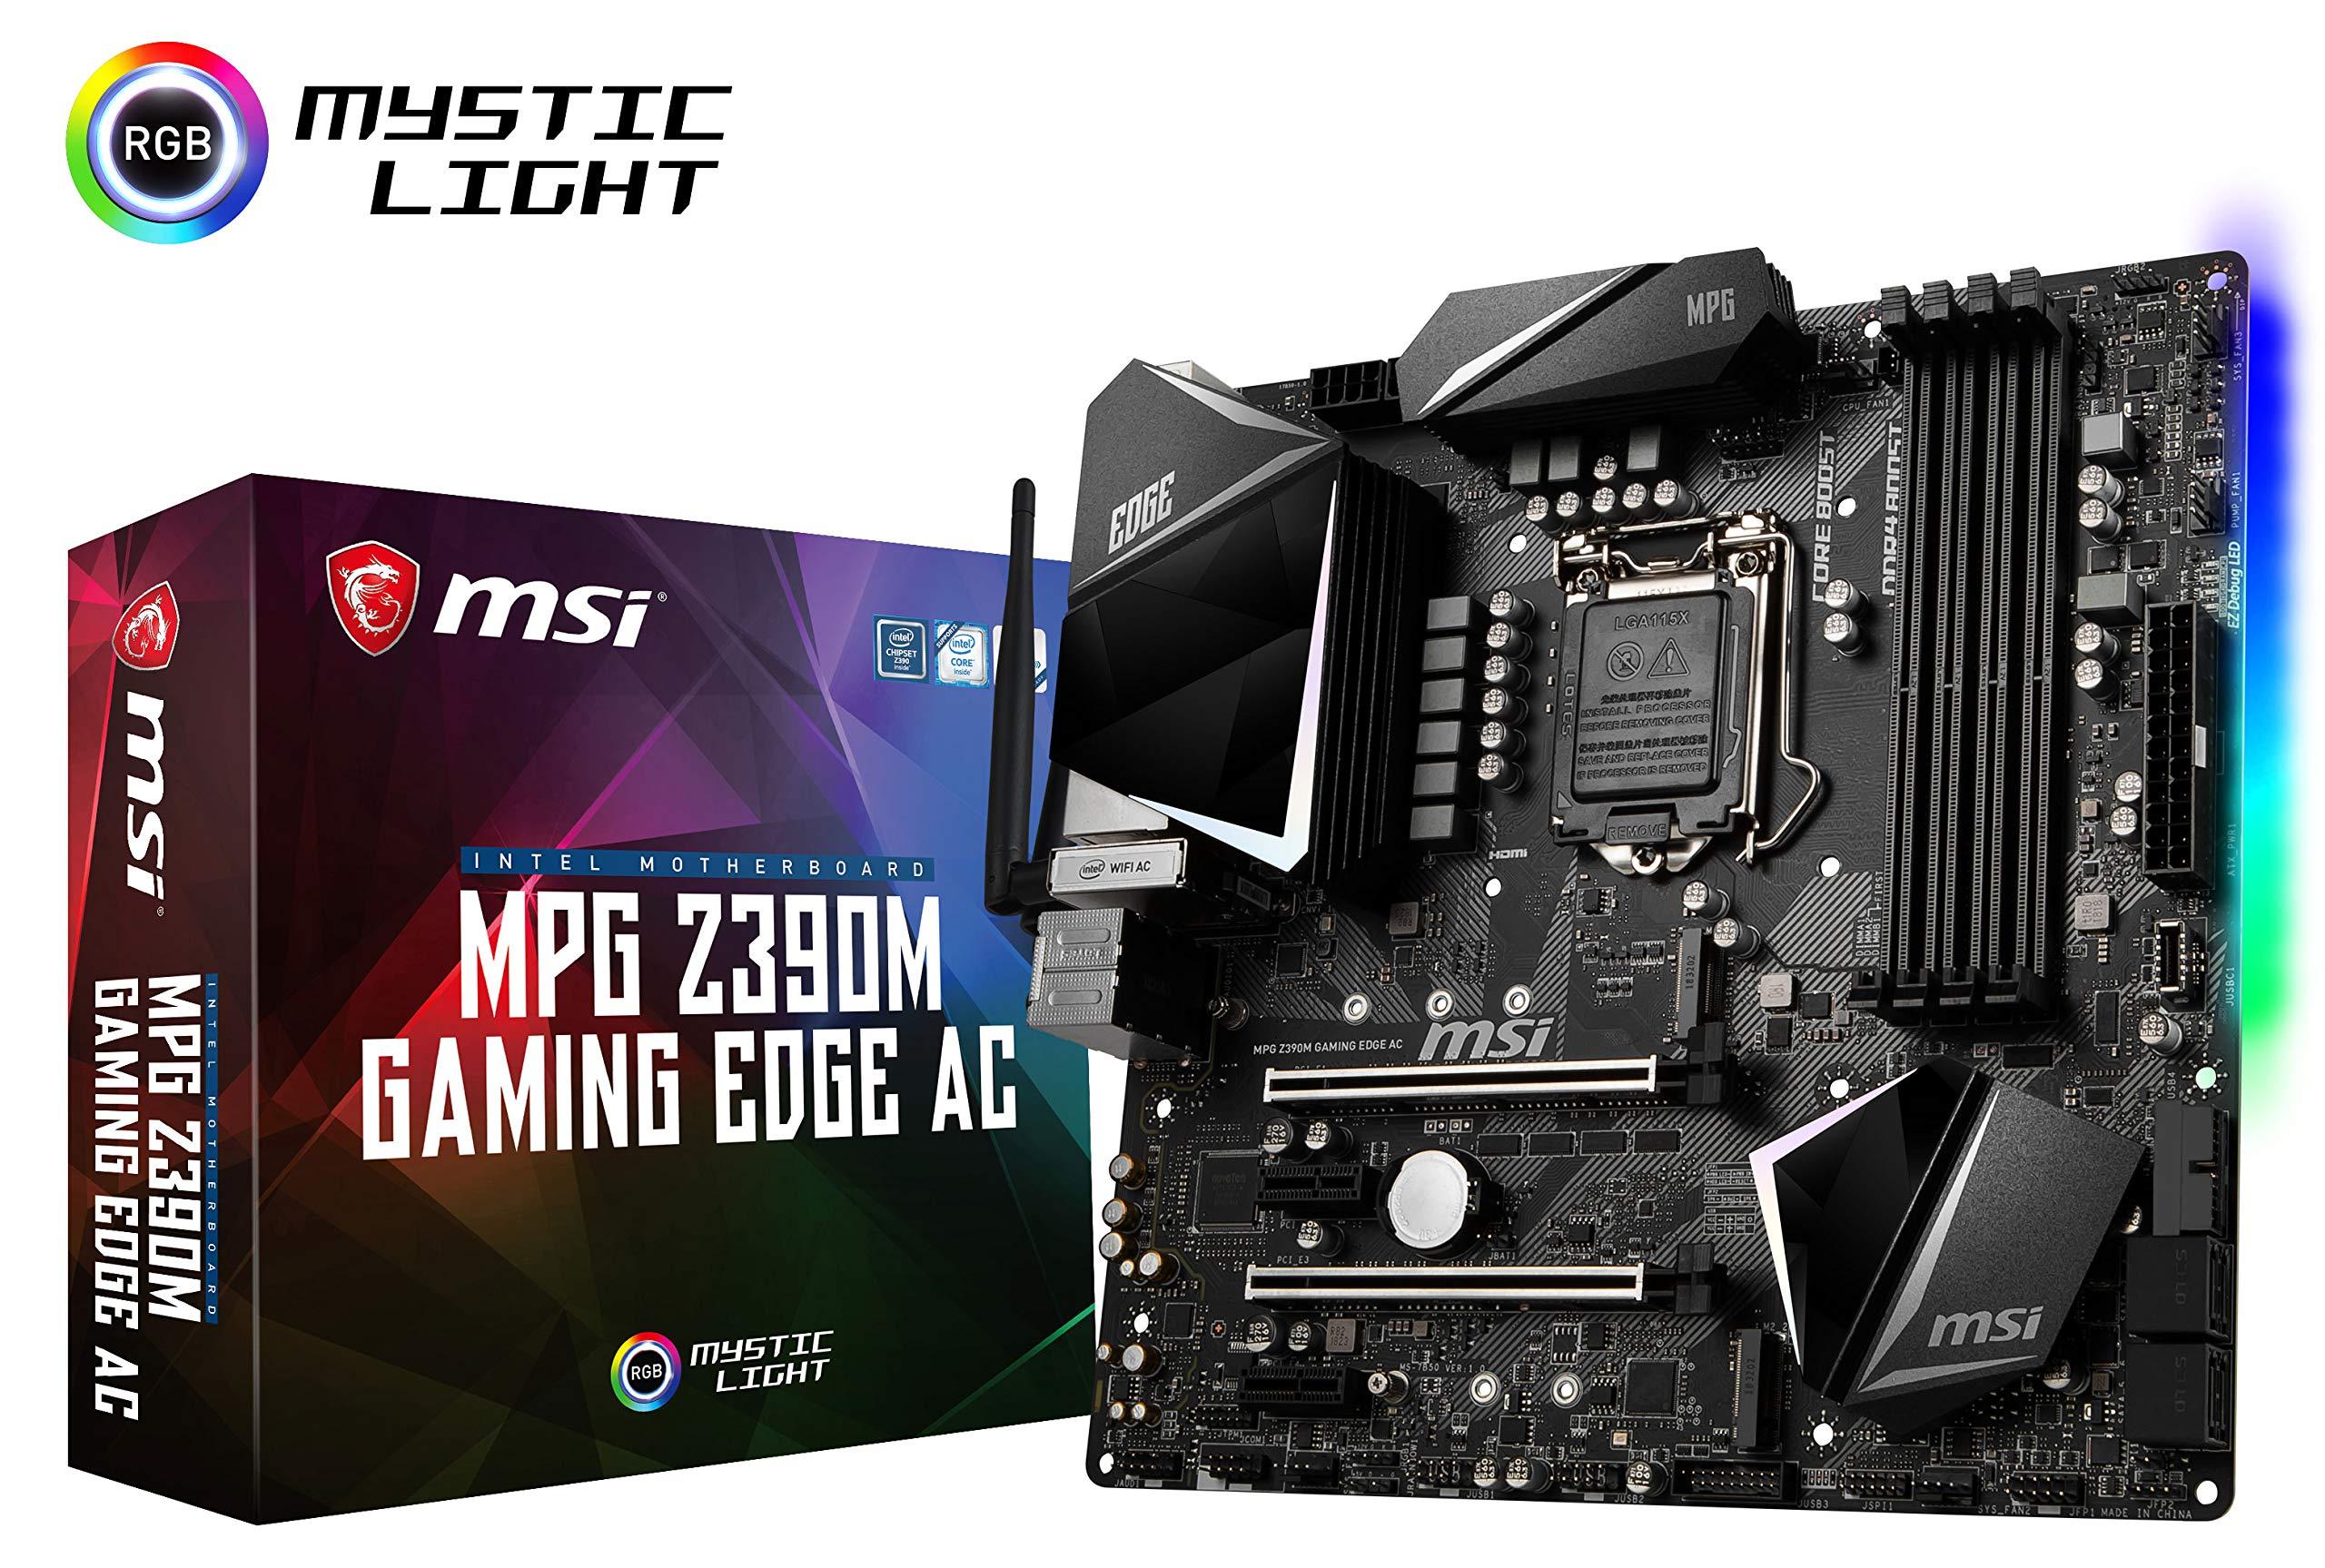 MSI MPG Z390M Gaming Edge AC LGA1151 (Intel 8th and 9th Gen) M.2 USB 3.1 Gen 2 DDR4 HDMI DP Wi-Fi SLI CFX Micro ATX Z390 Gaming Motherboard by MSI